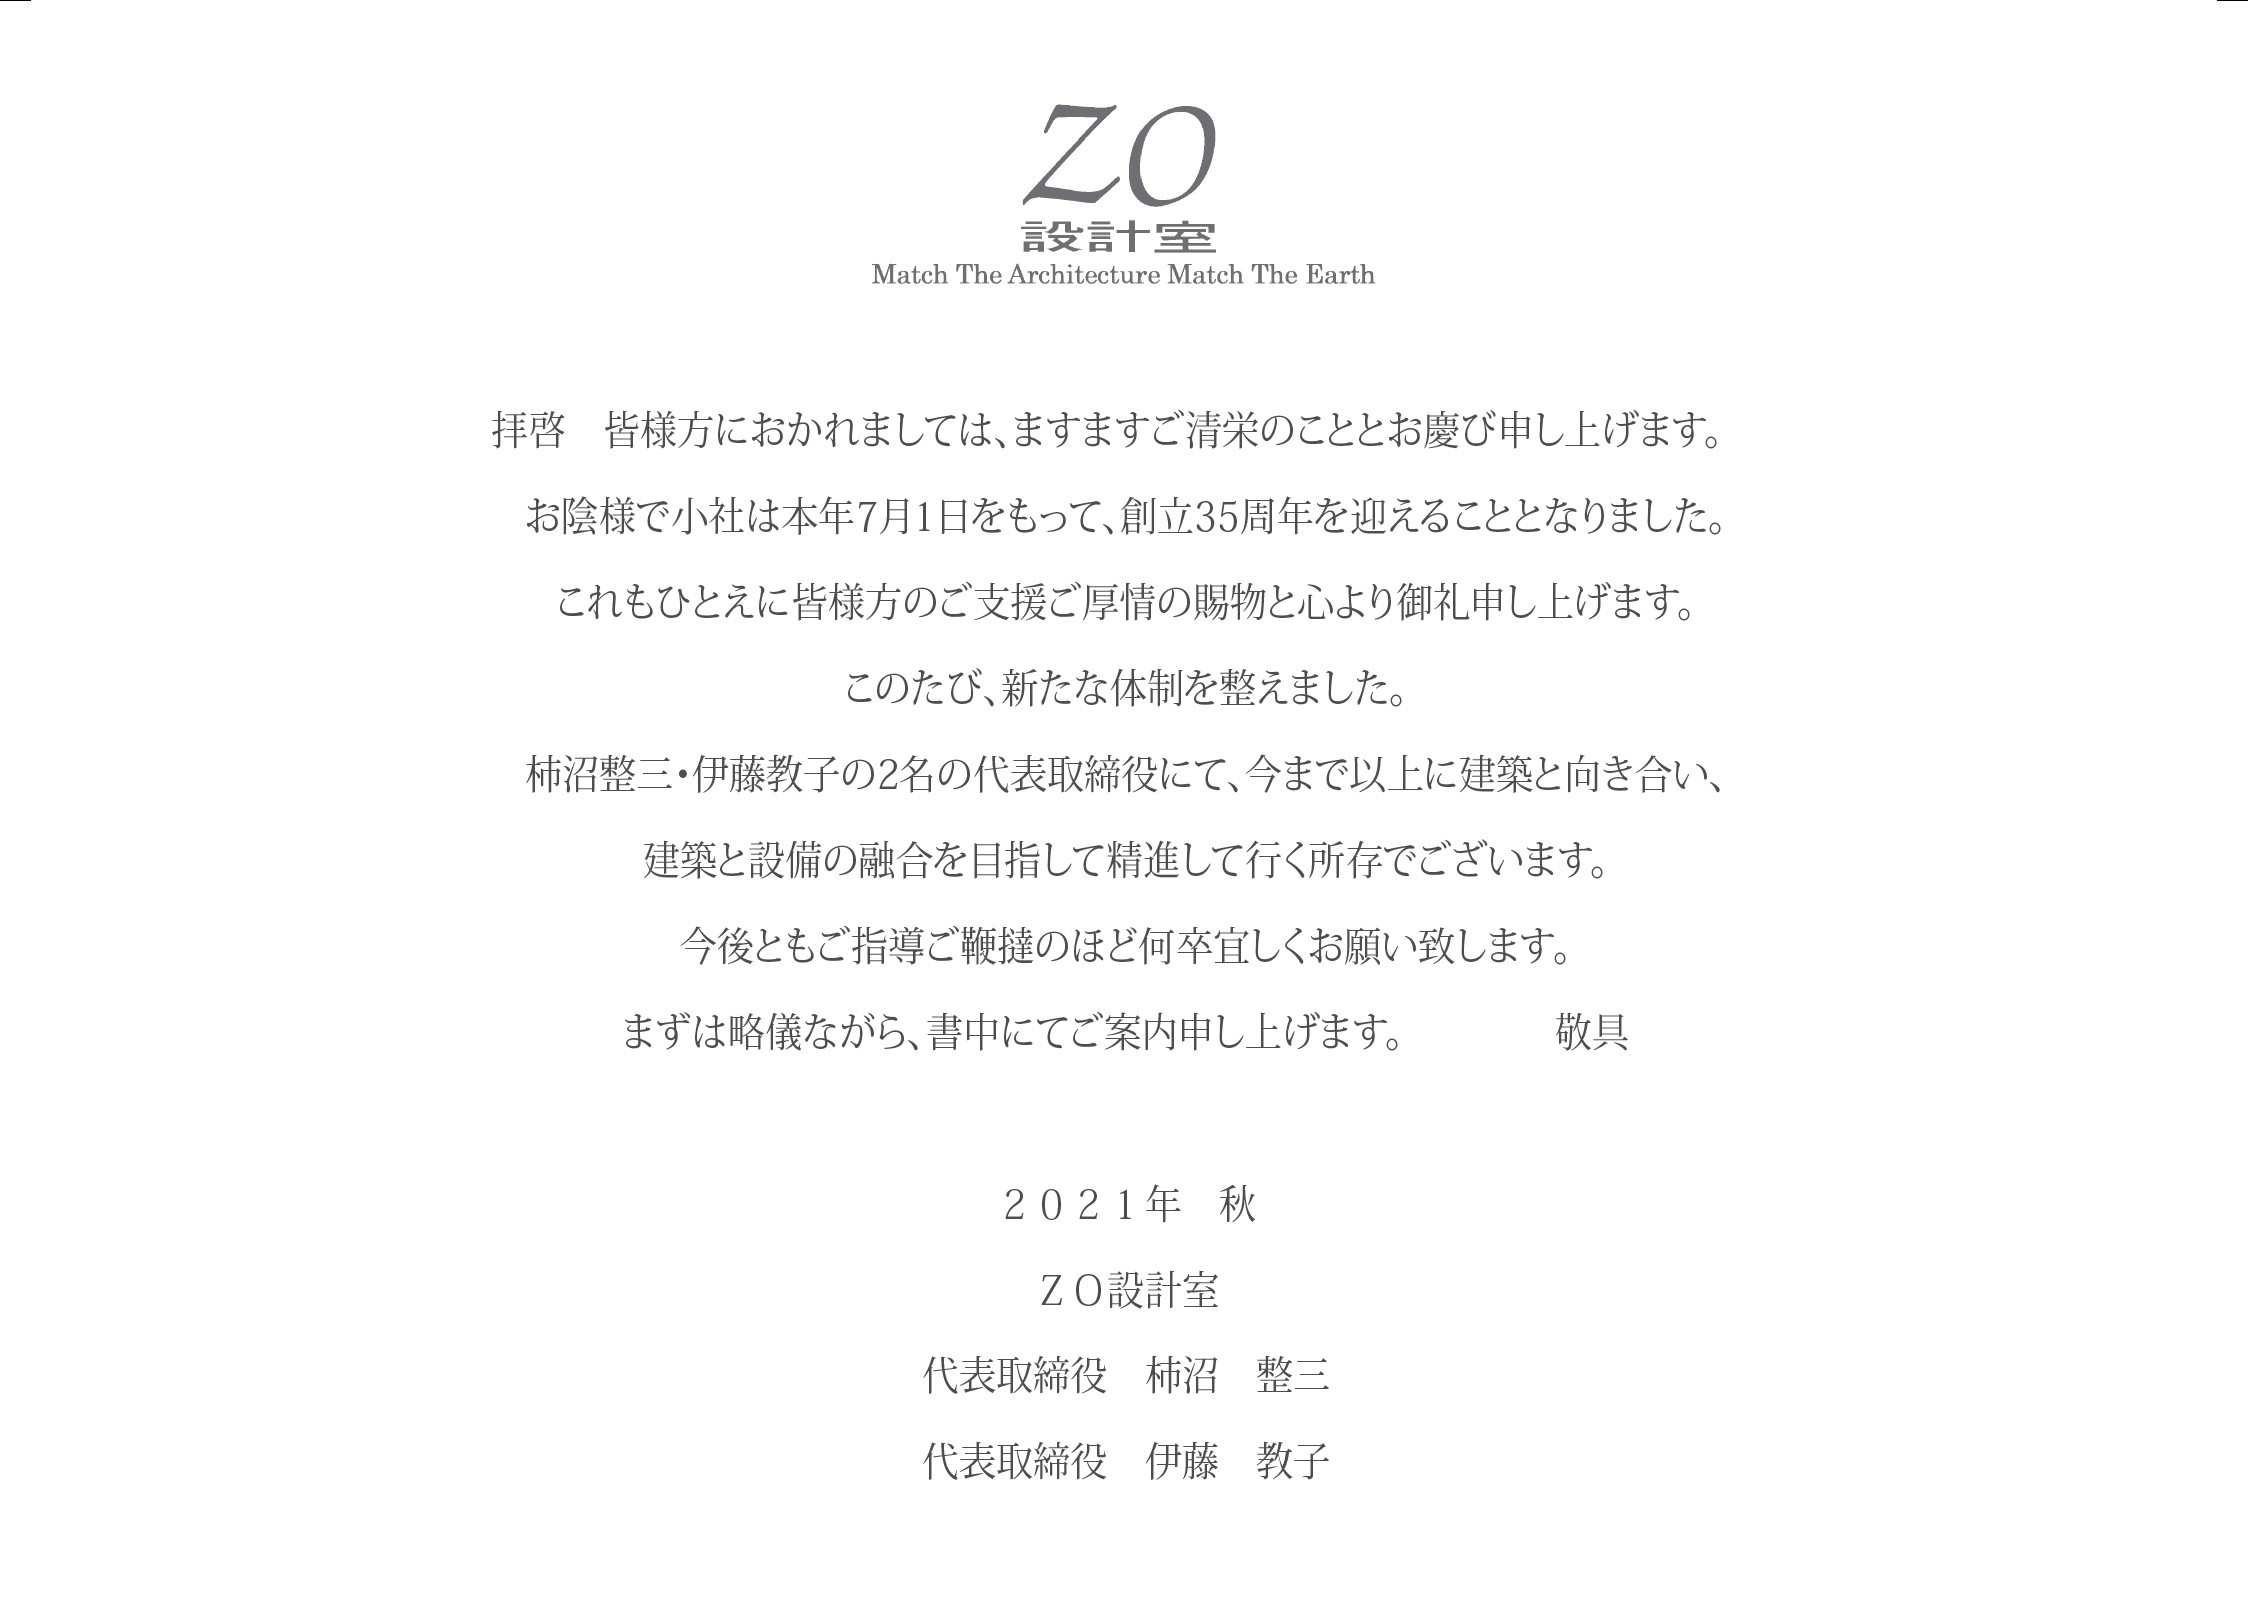 伊藤 代表取締役就任のご挨拶_a0142322_10492531.jpg